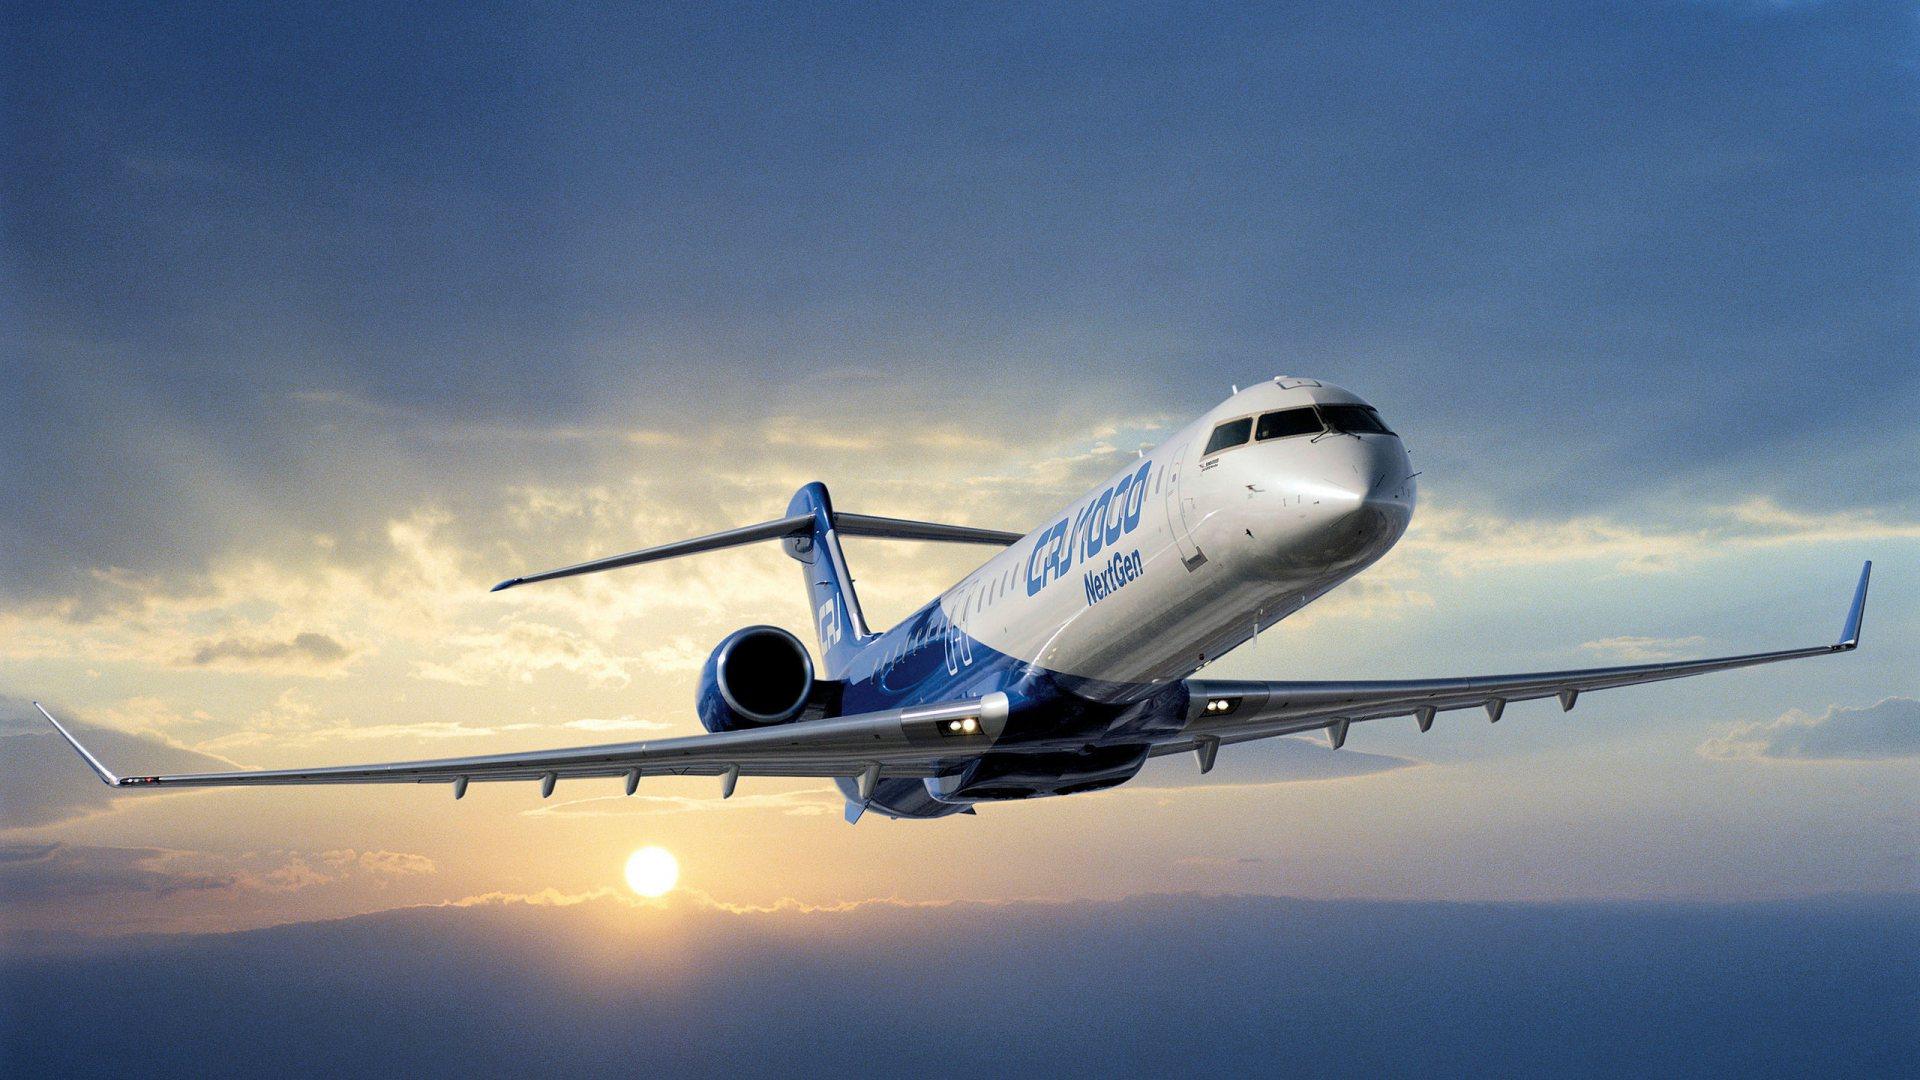 Aircraft Vehicles Hd 309595 Wallpaper wallpaper